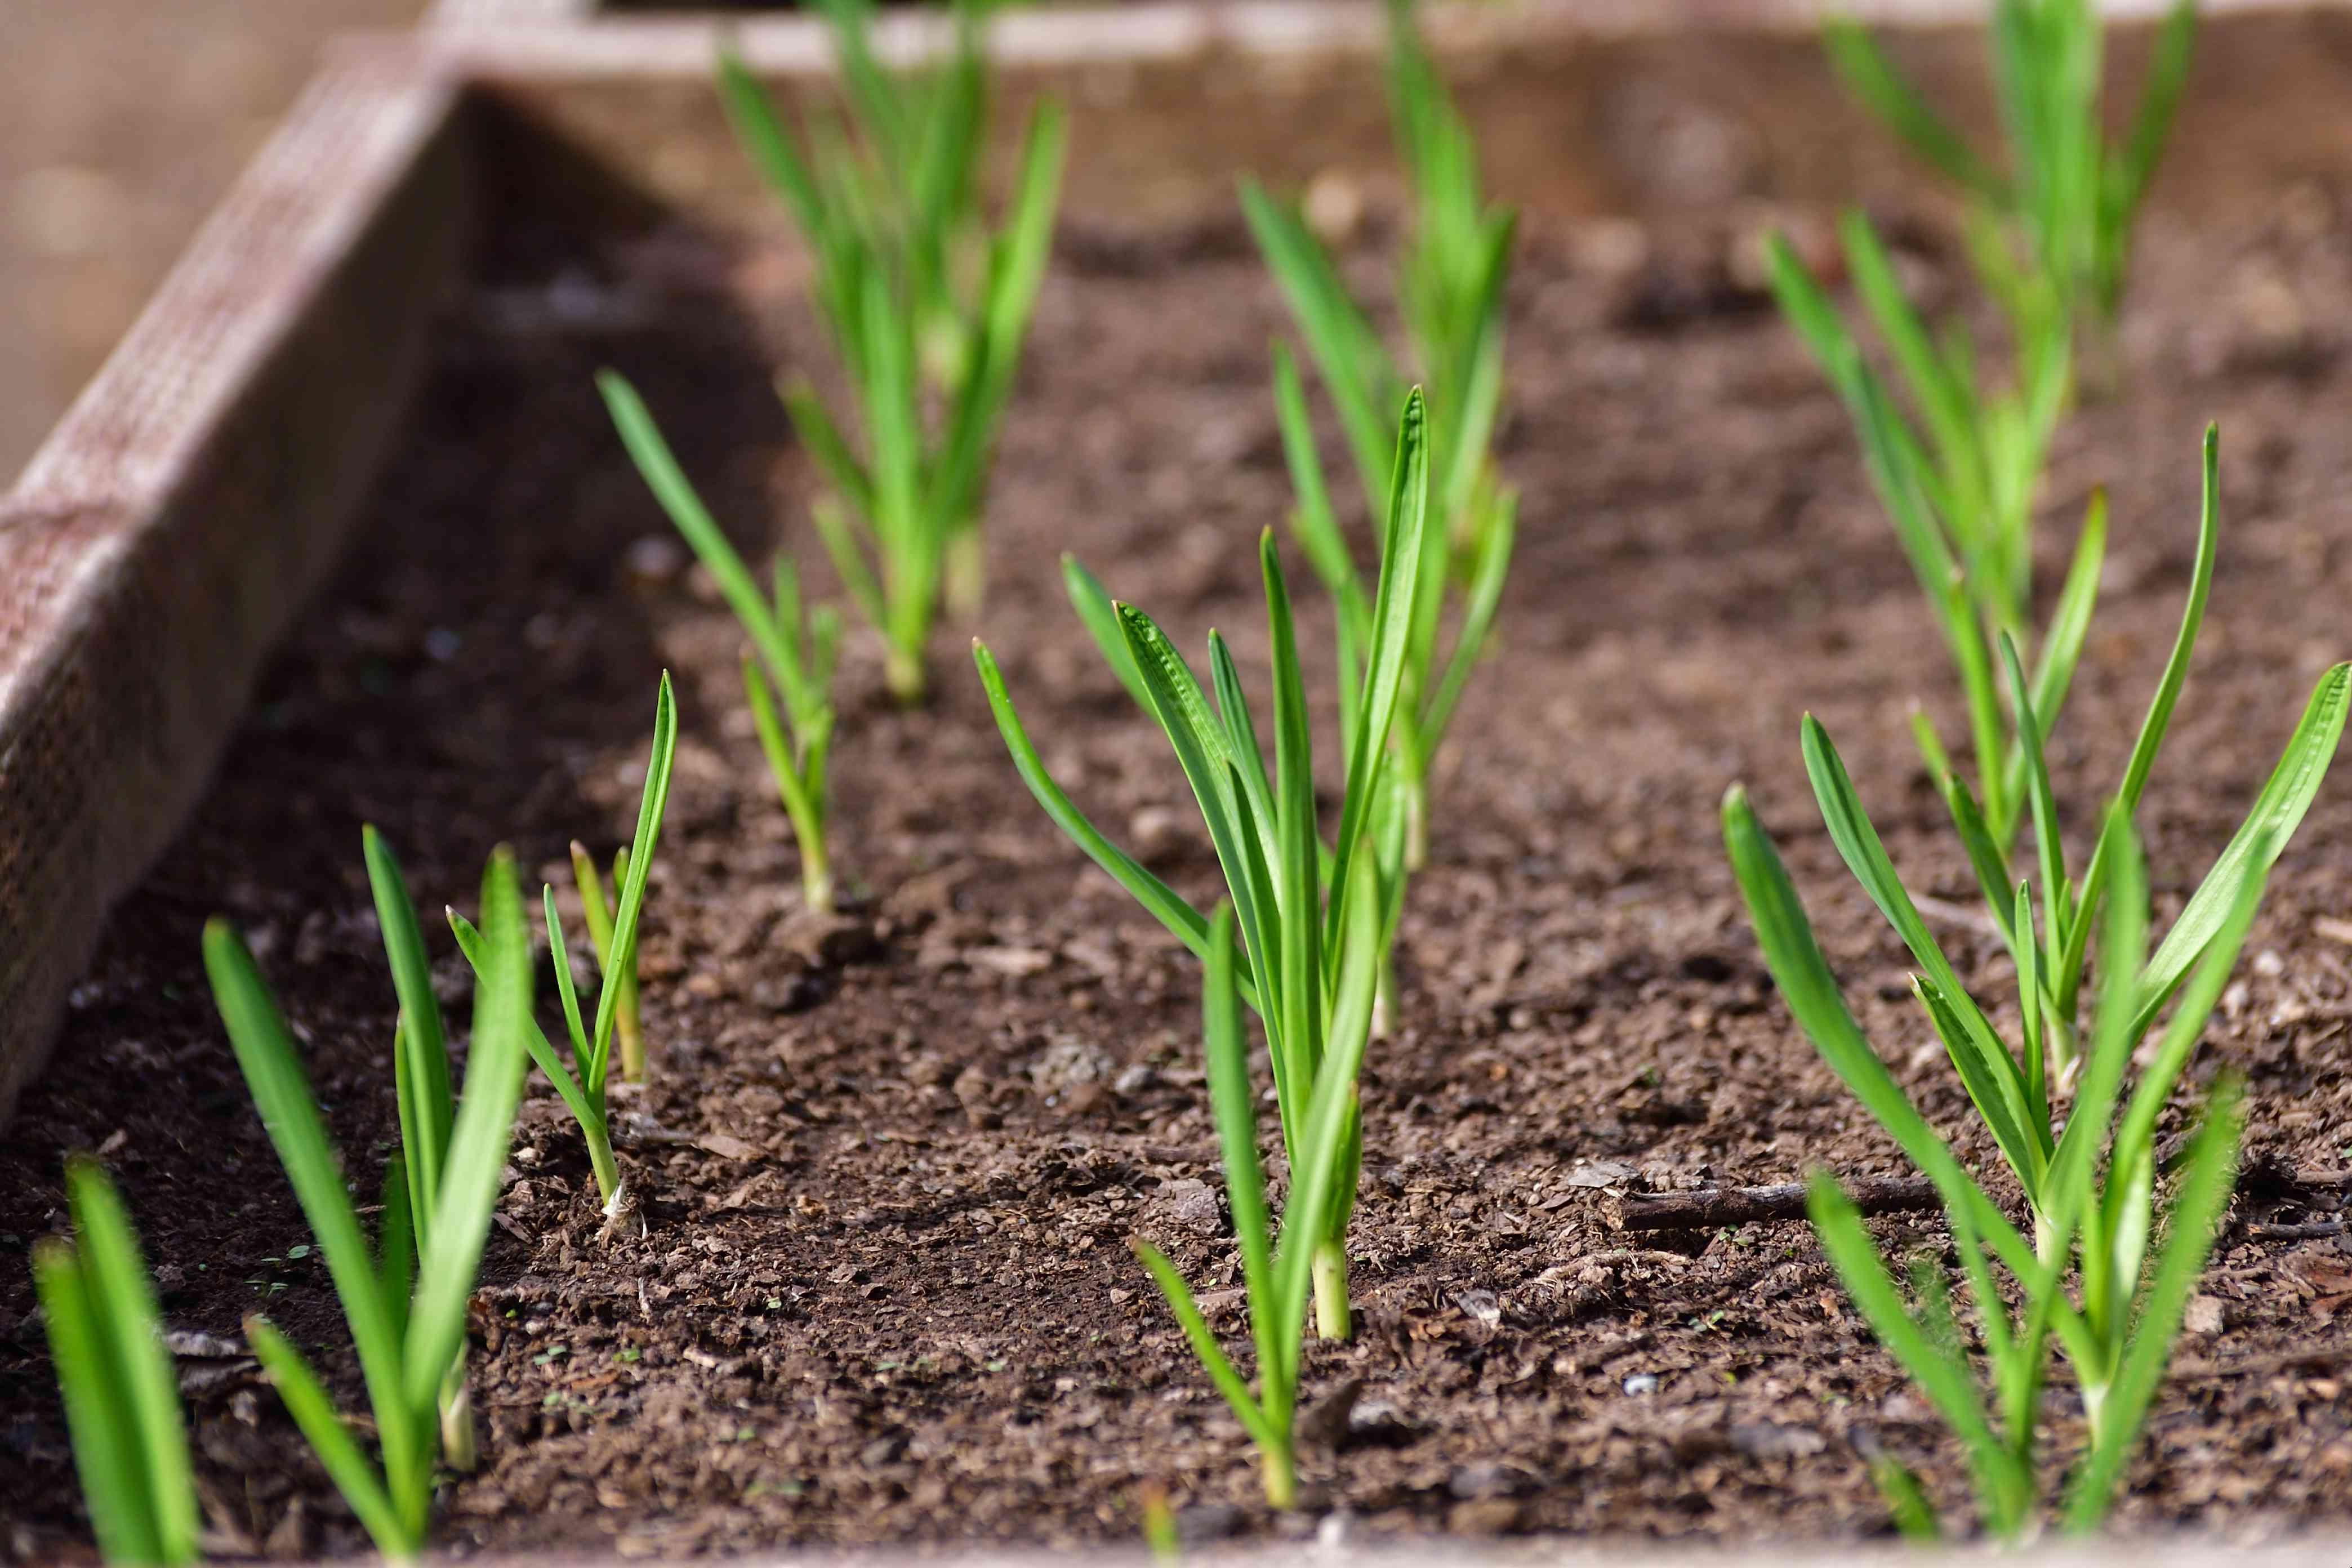 Sprouted garlic in raised garden beds grown as winter crop